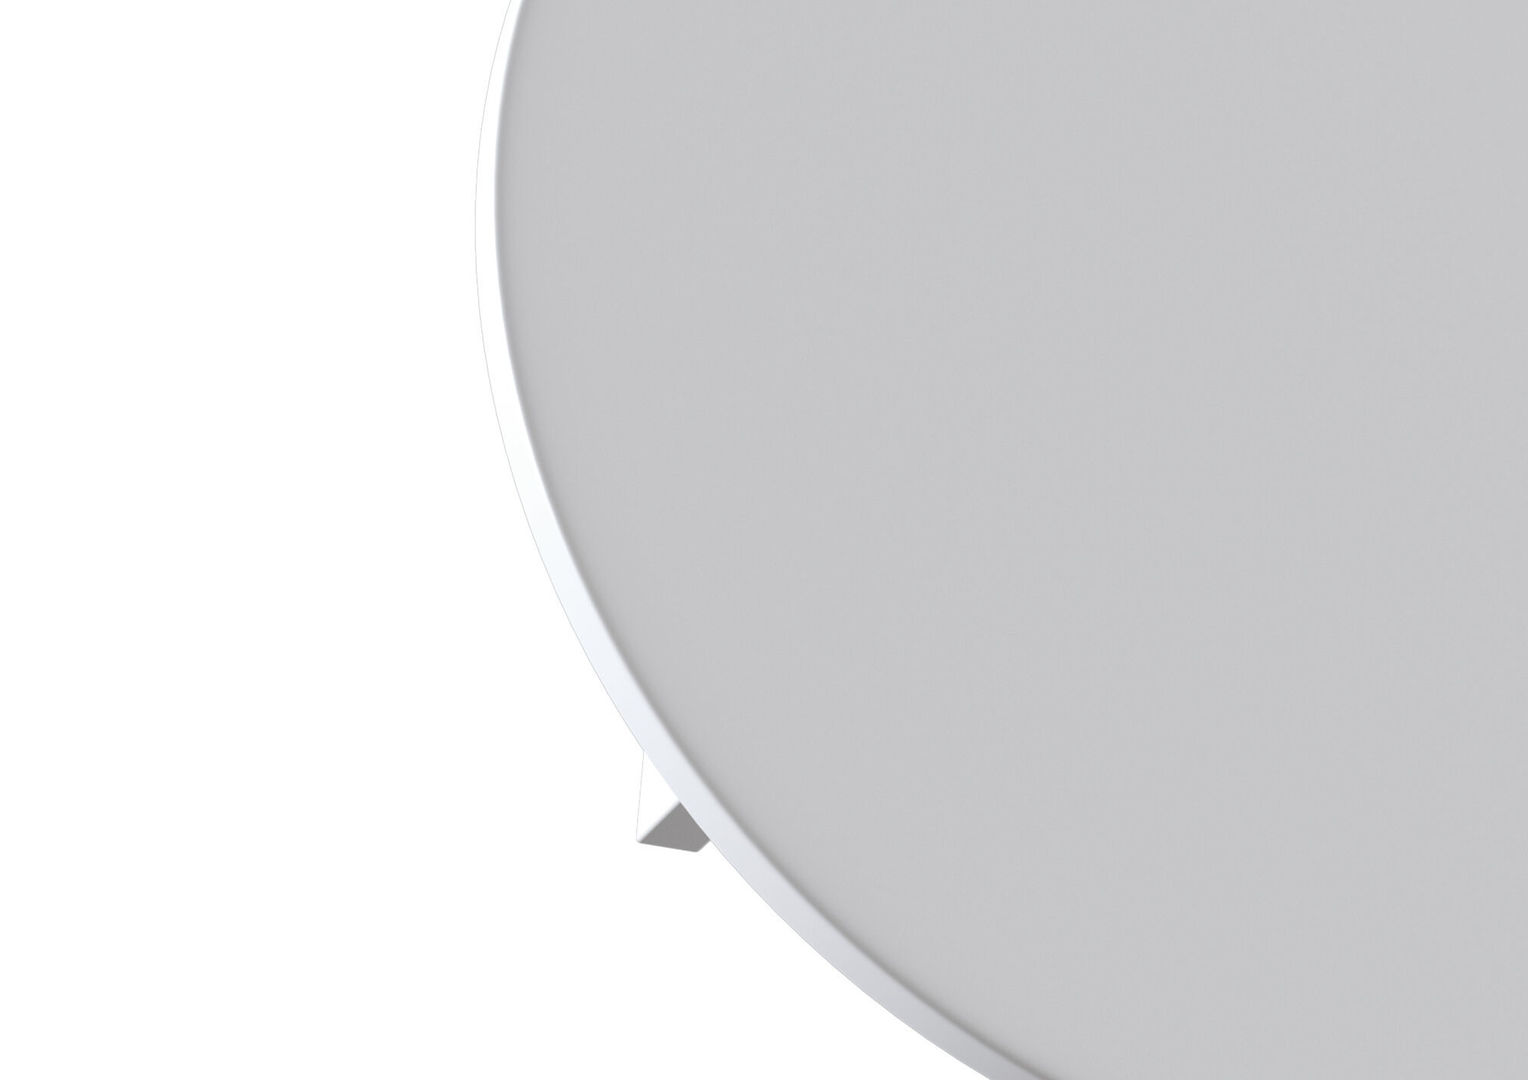 Wall light Maytoni Parma C123-WL-02-3W-W